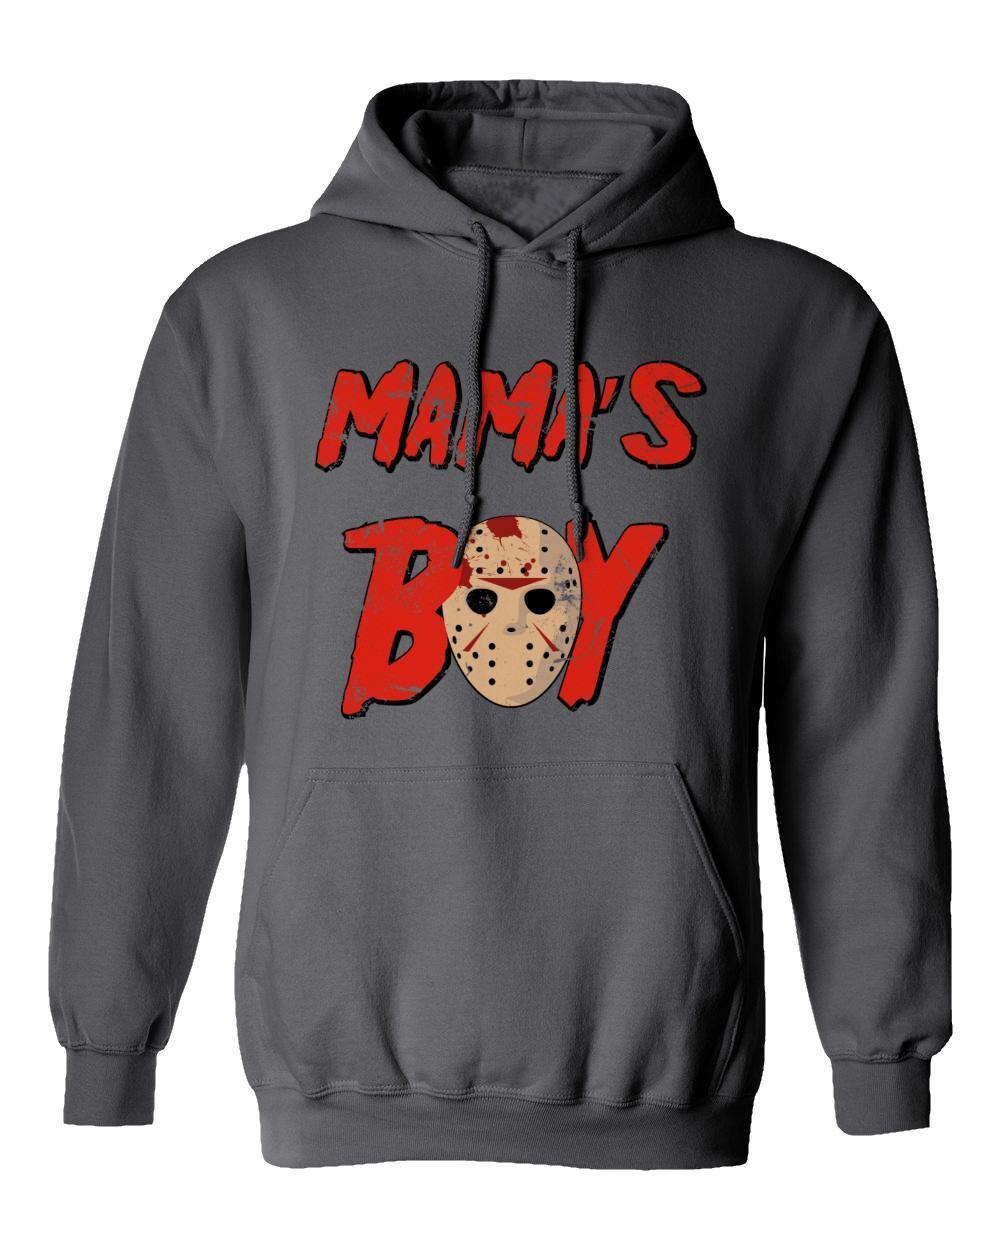 d31c699a1 Friday 13th Horror Scary Jason Vorhees Men's Hooded Sweatshirt Shirt ...